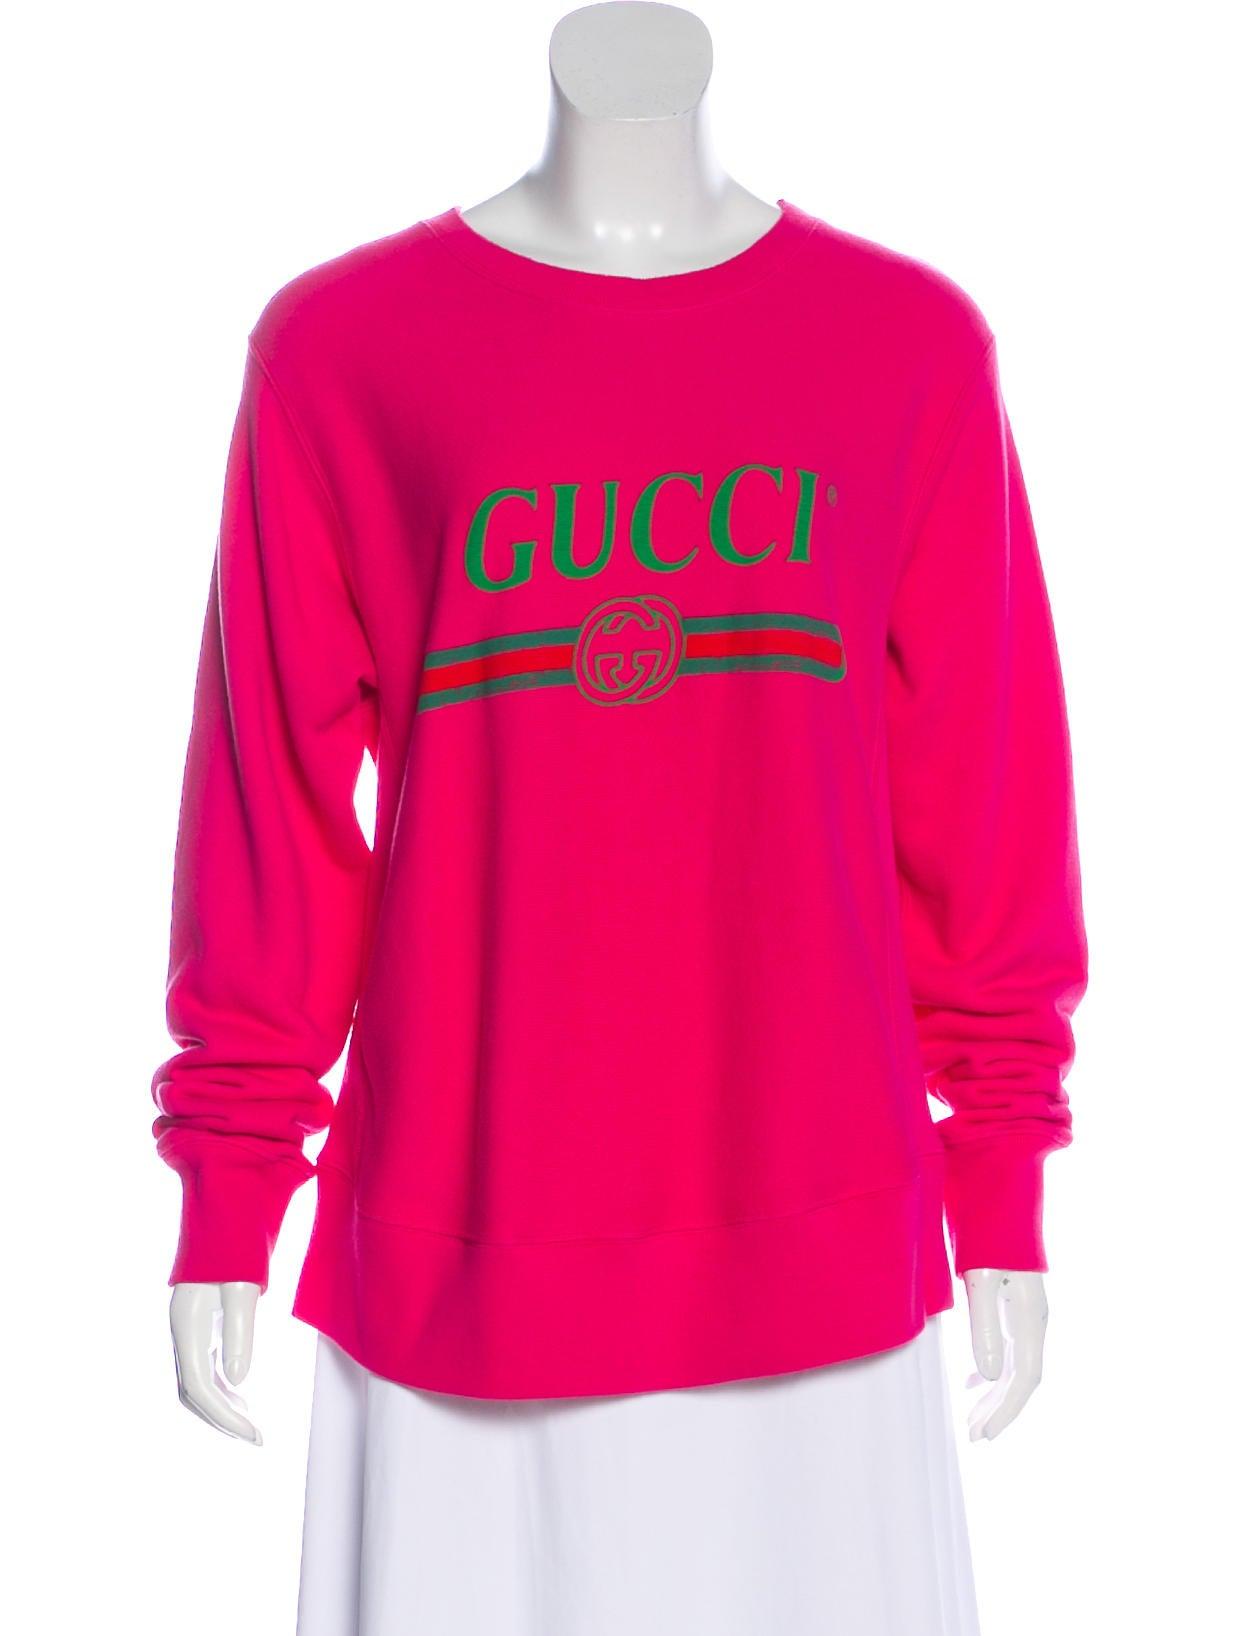 e7892a9bbcb Gucci 2017 Logo Print Sweatshirt - Clothing - GUC296067